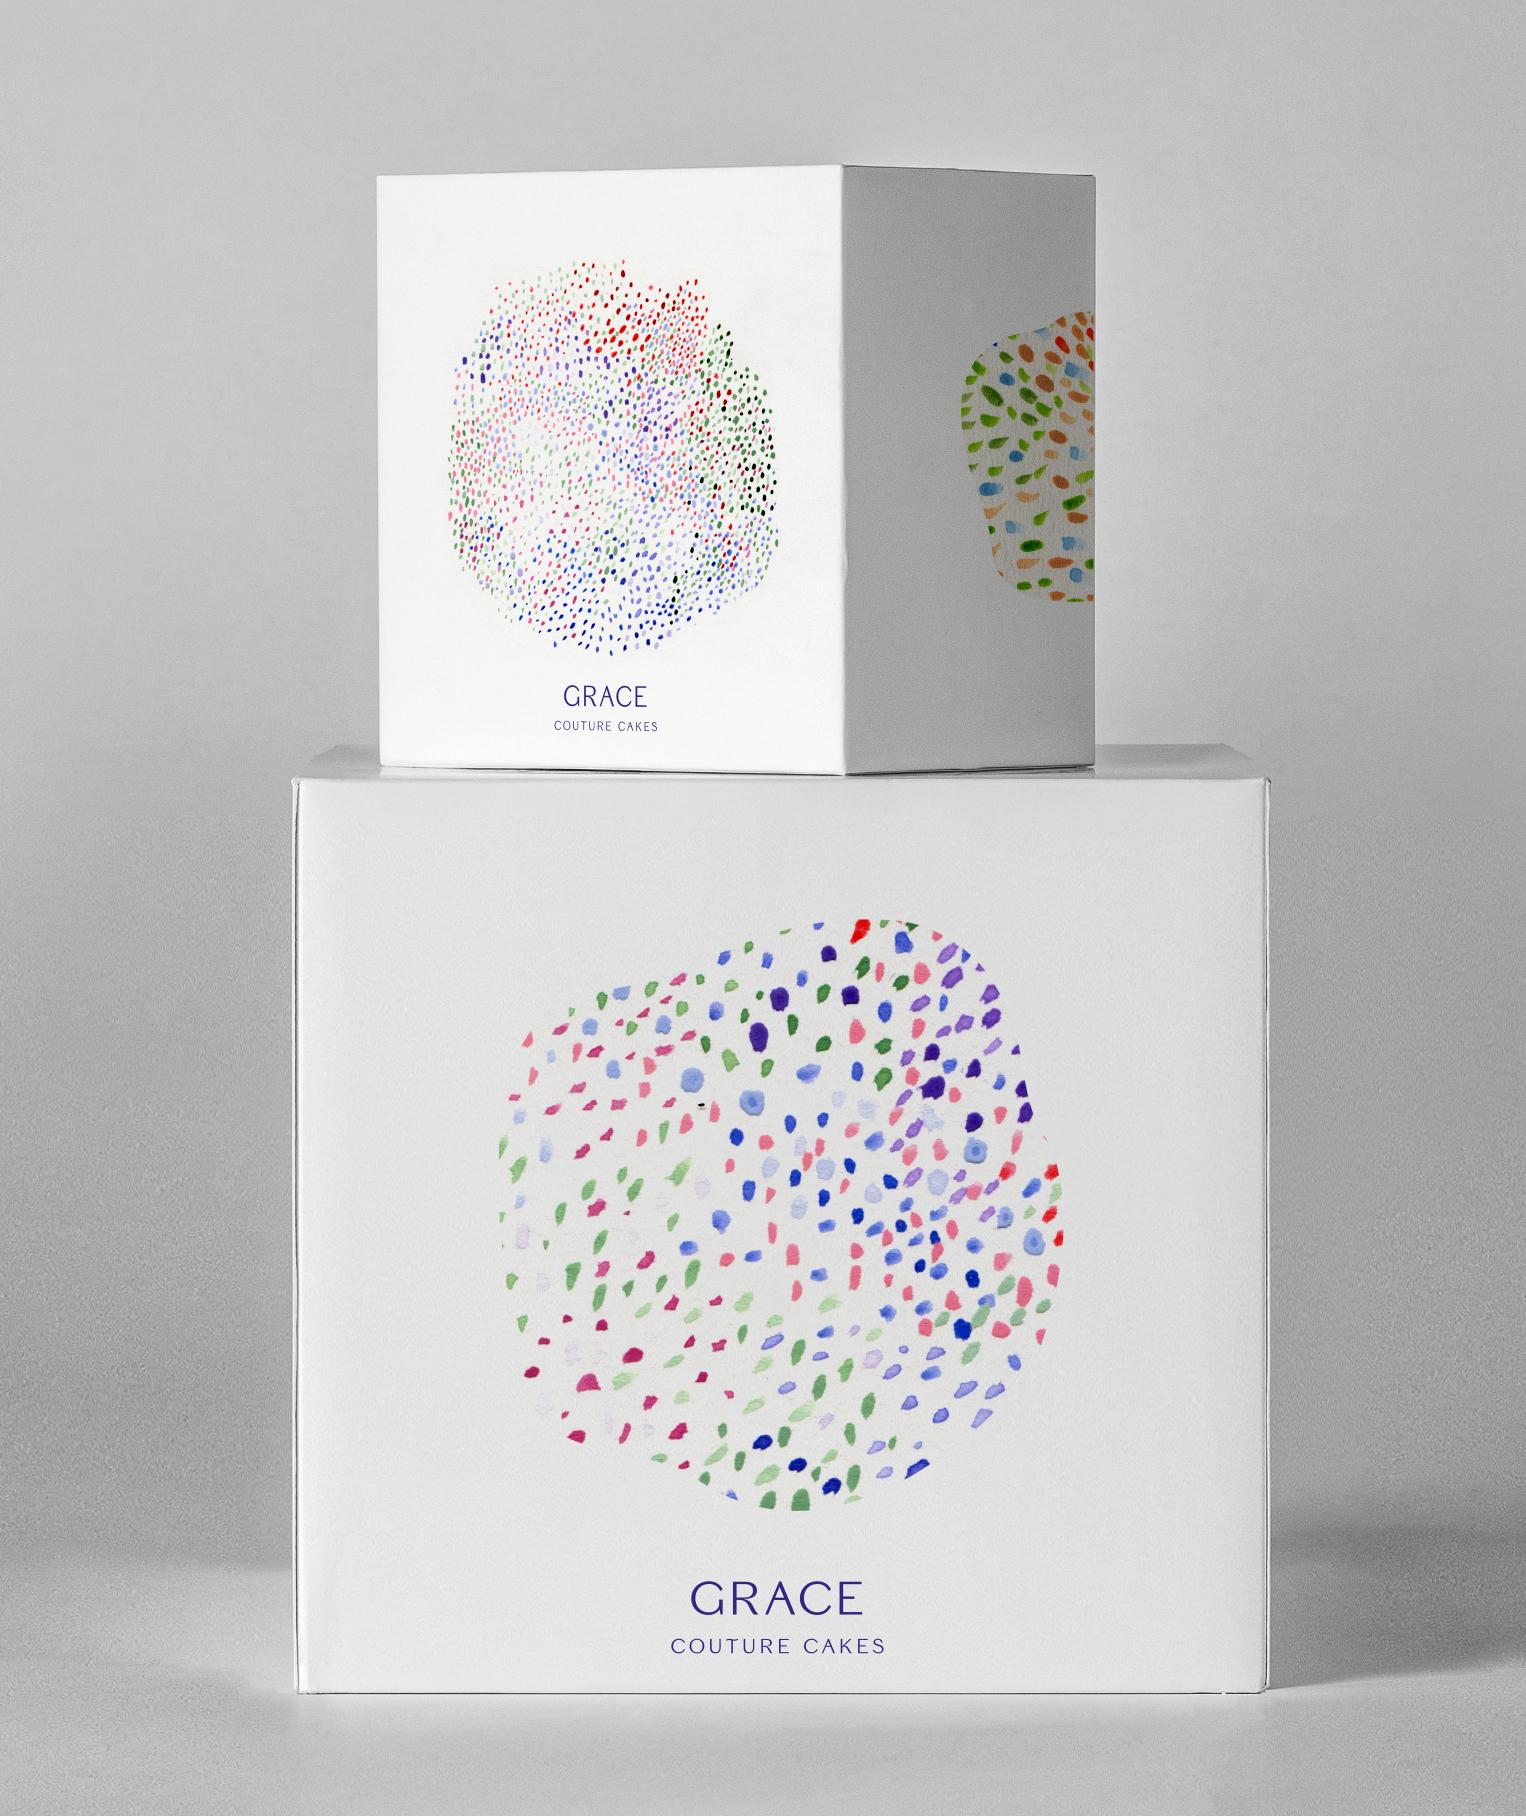 Rebranding a premium cake shop.  <br>|<br> Grace Couture Cakes - Duplicate